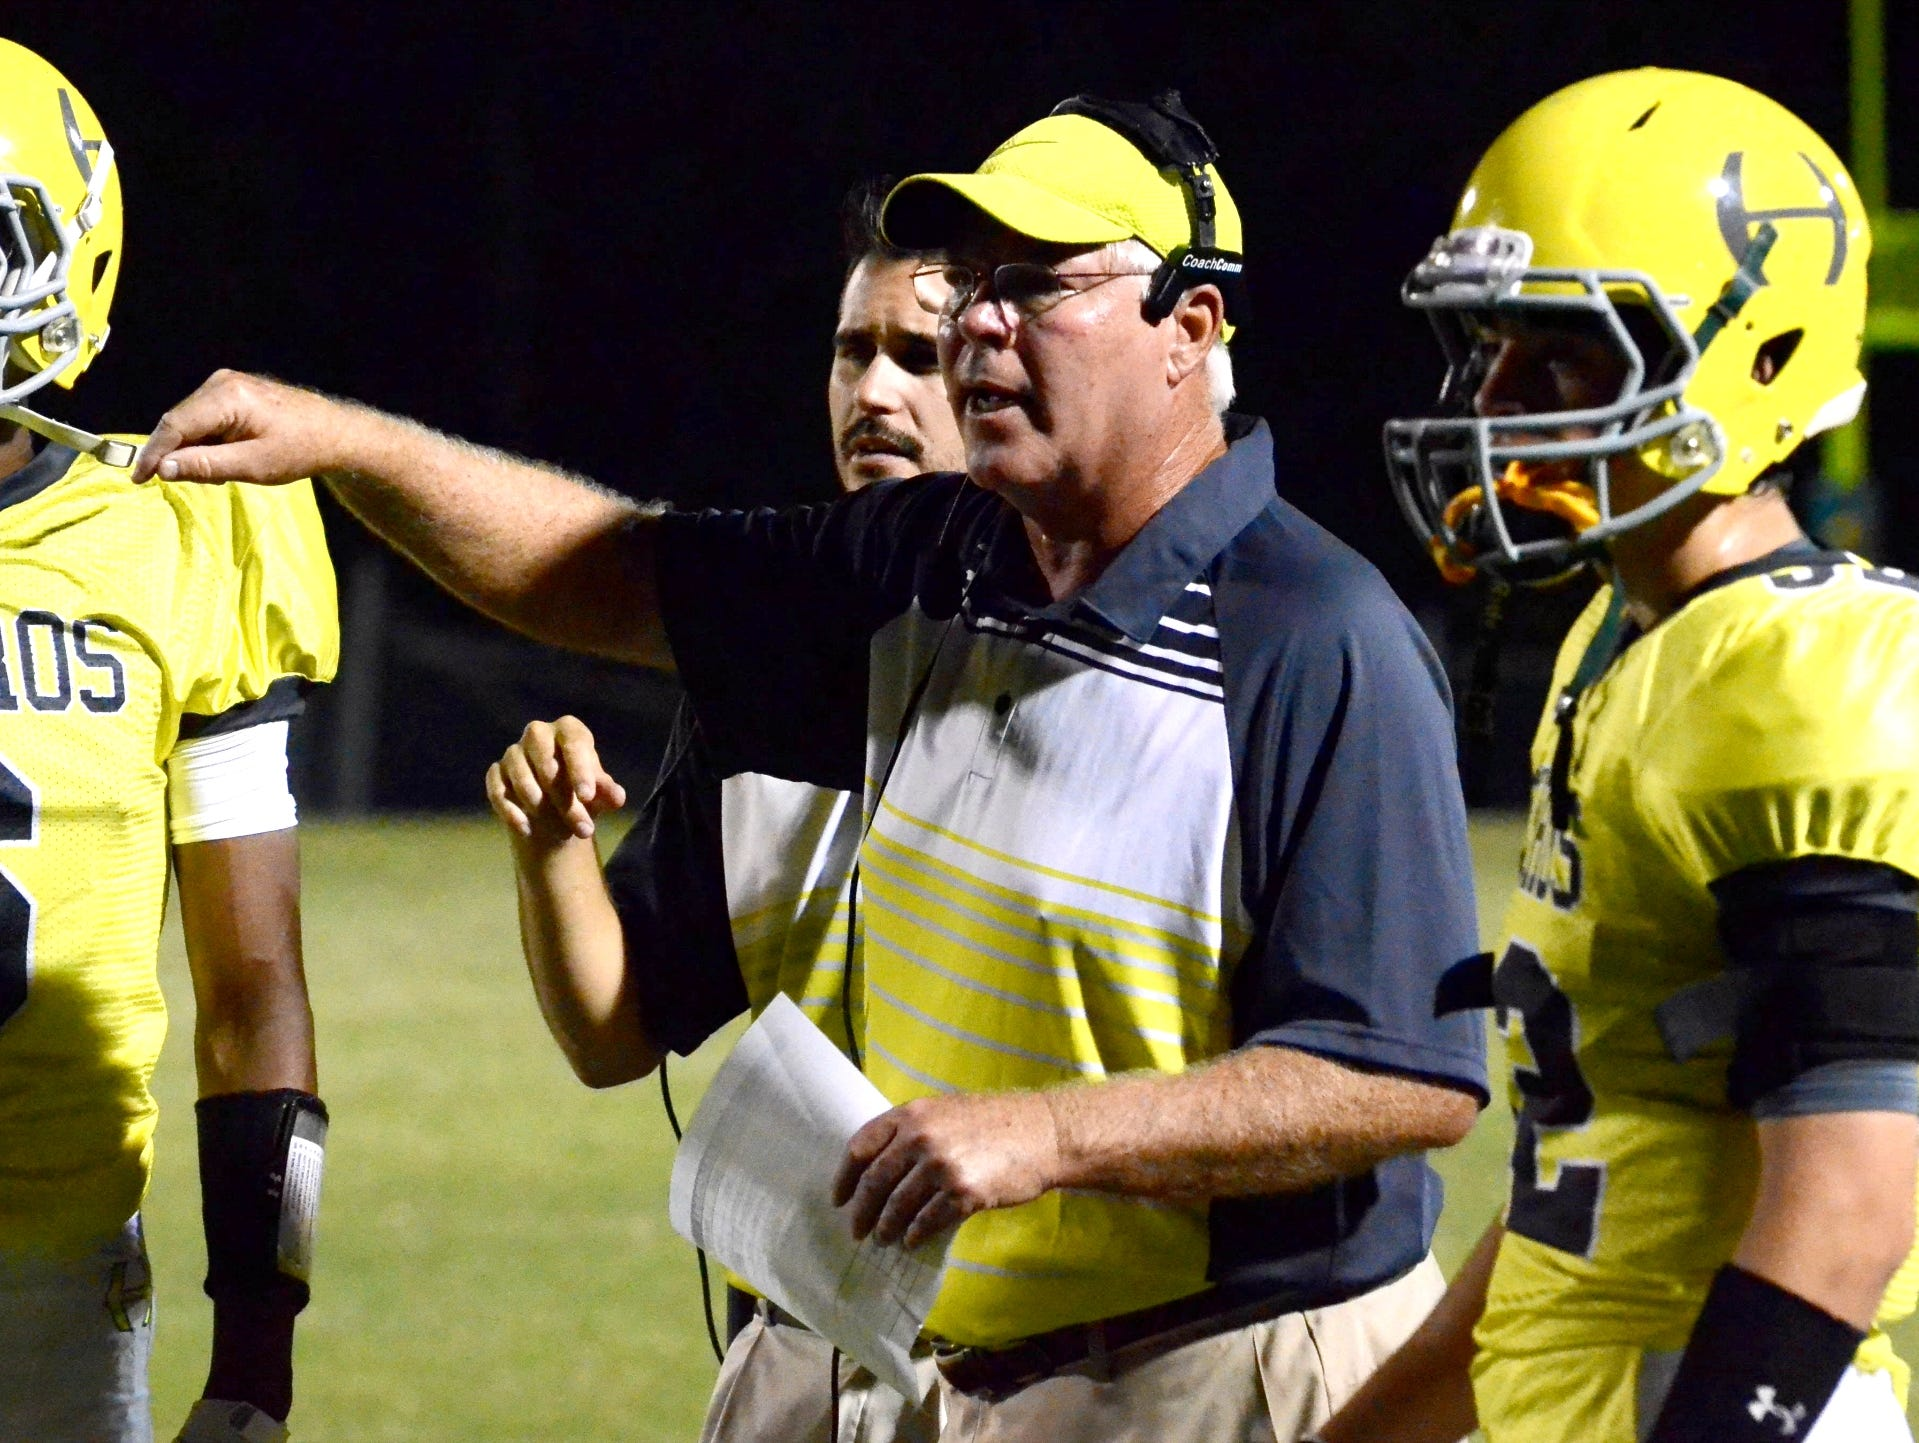 Hillsboro coach Craig Clayton